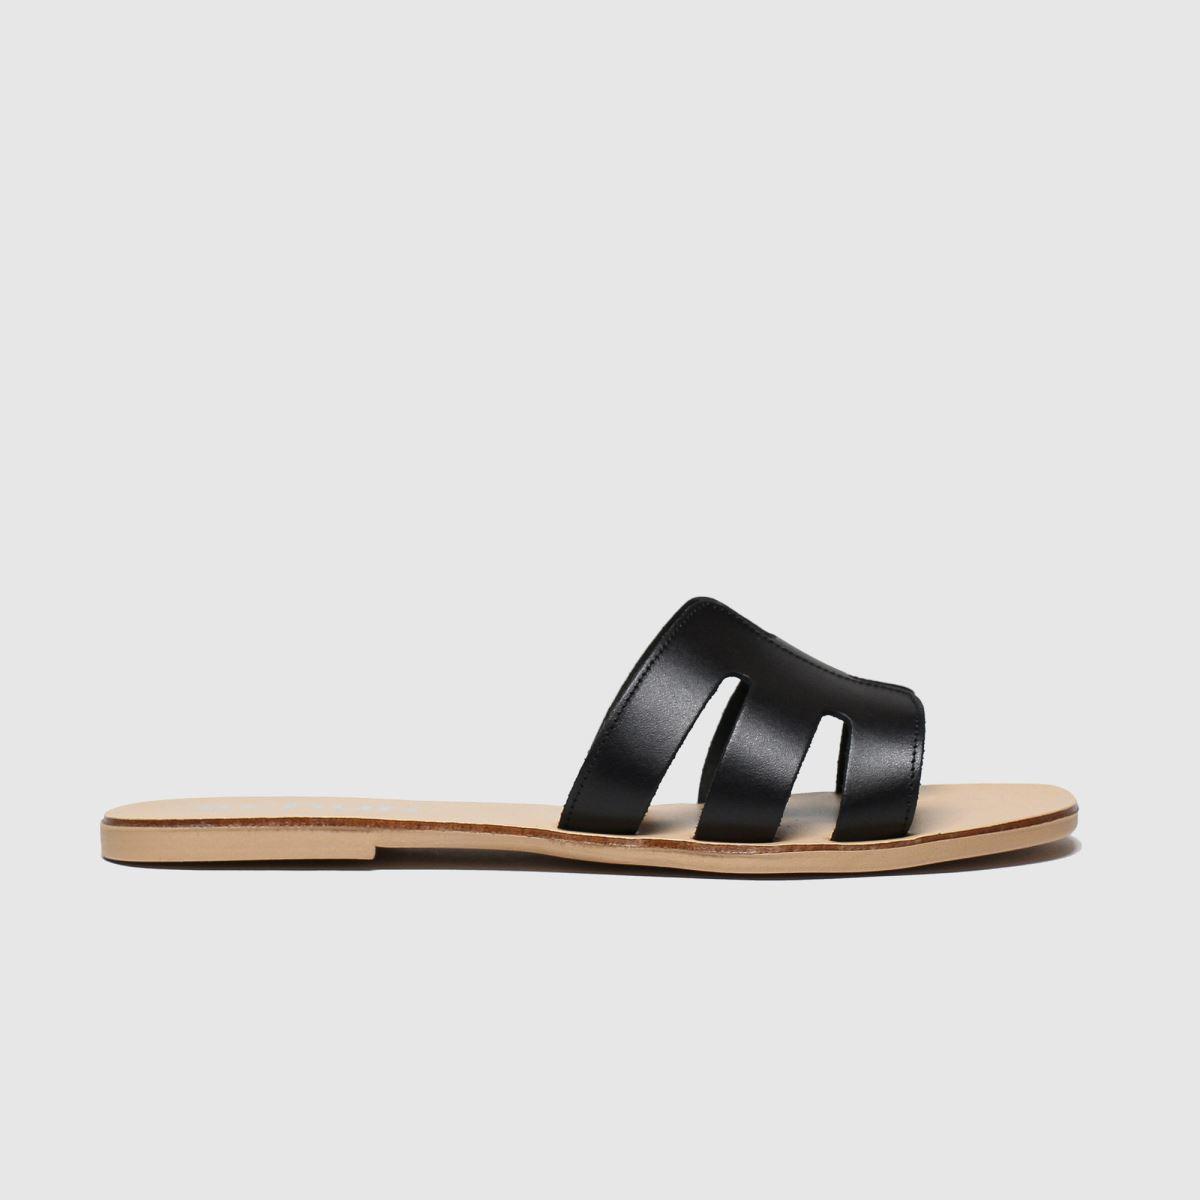 schuh Schuh Black Palma Sandals